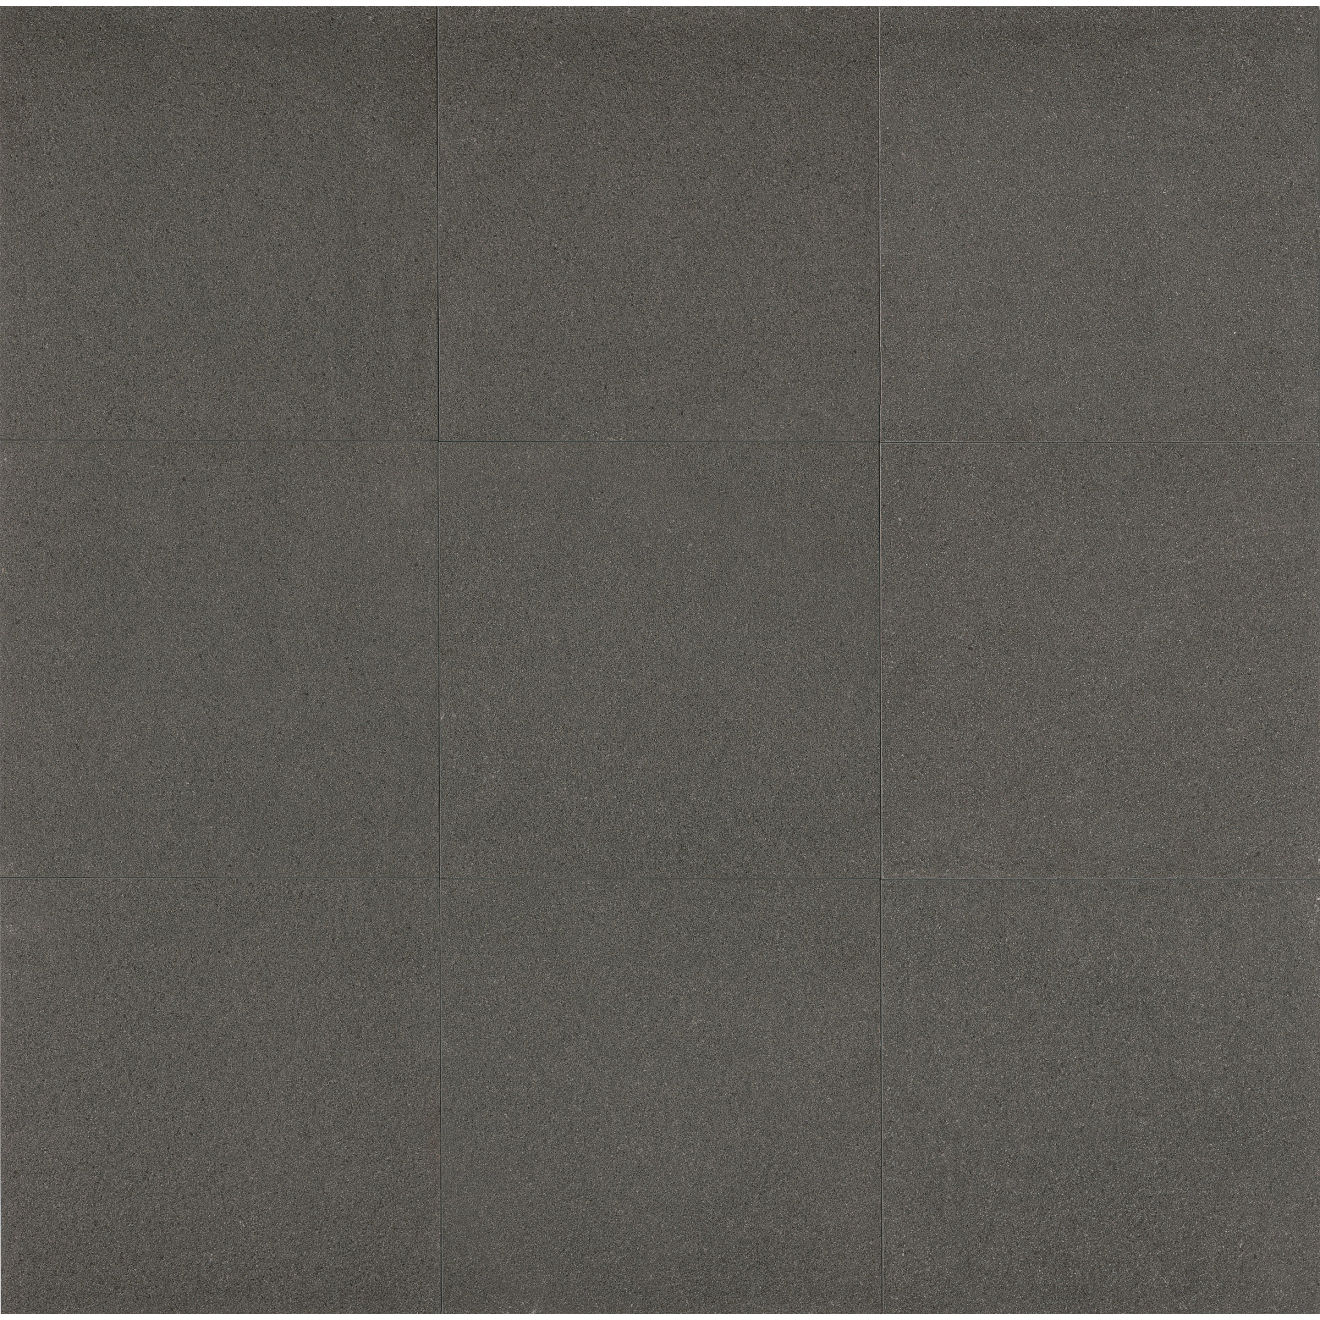 "Absolute Black 18"" x 18"" Floor & Wall Tile"